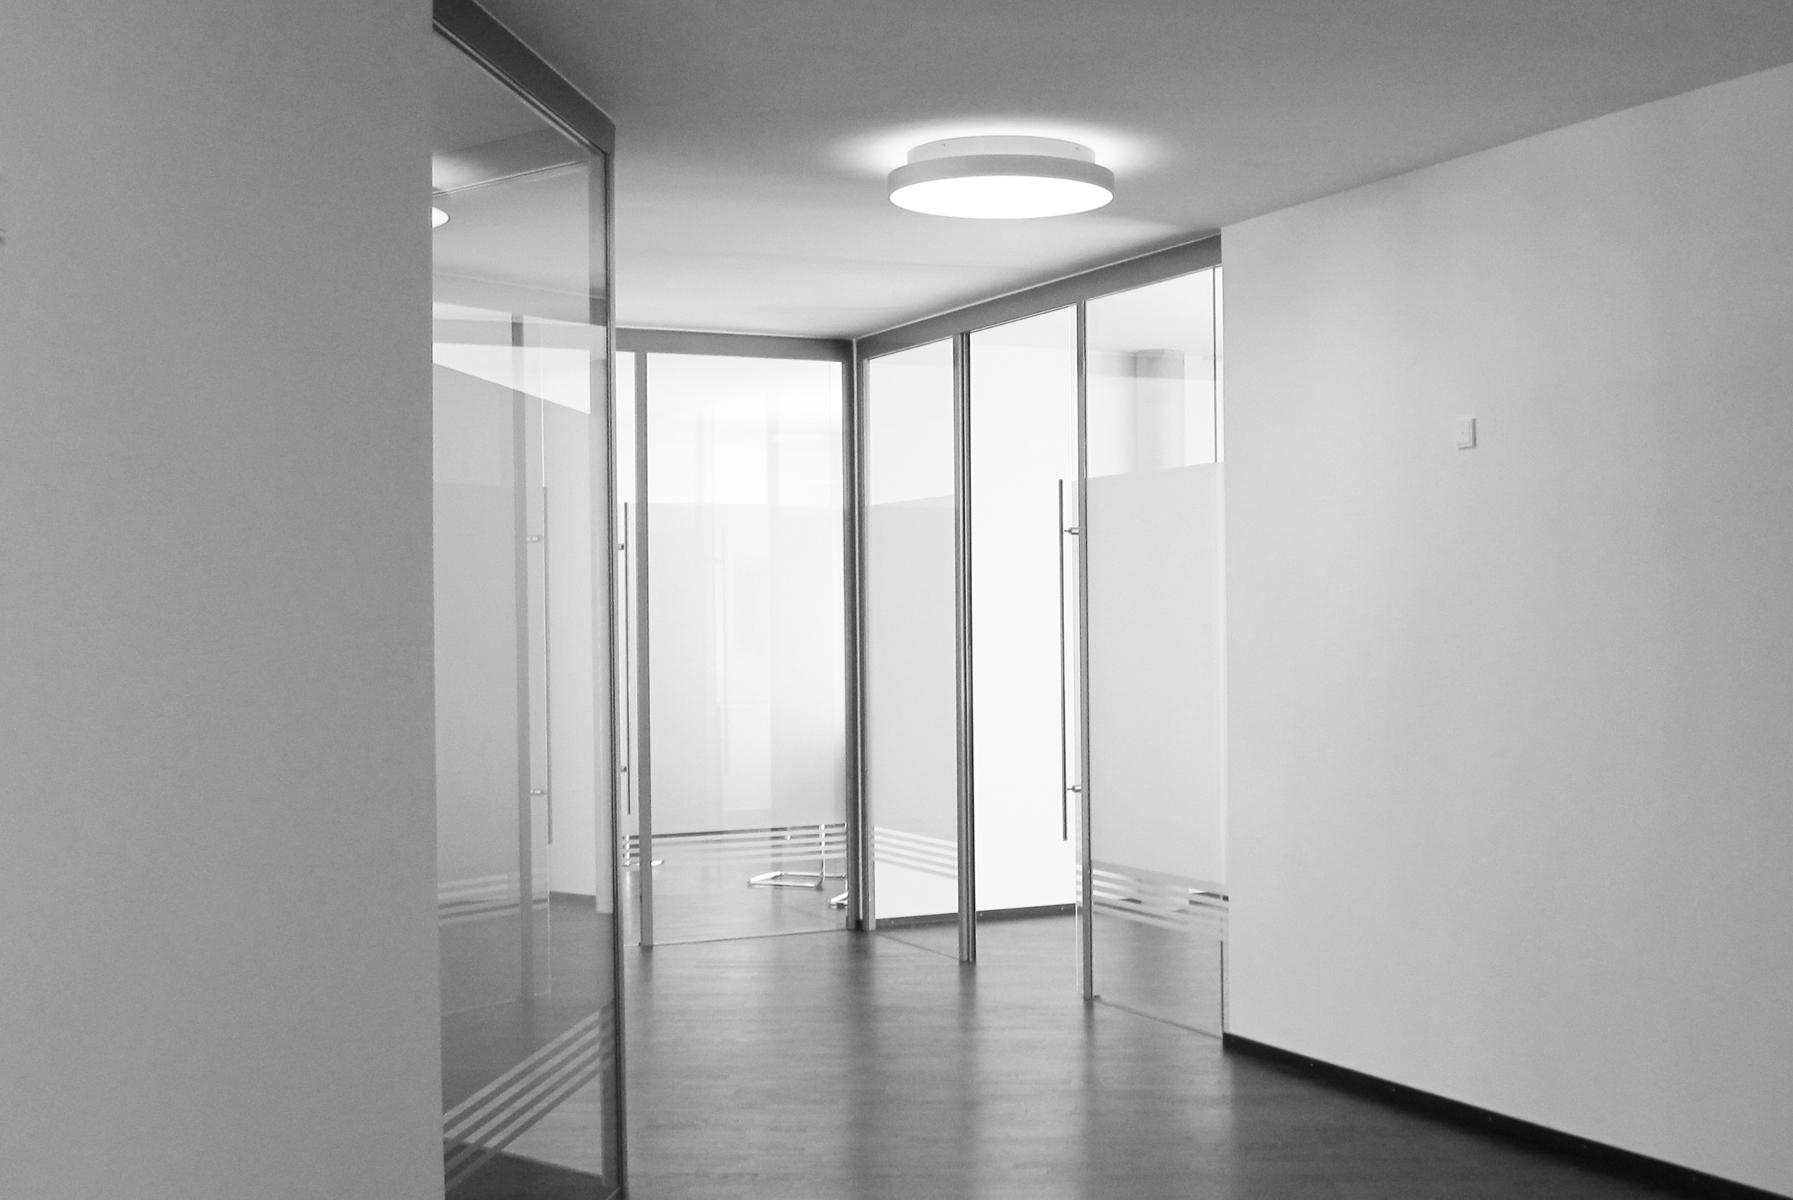 Profil duffner architekten bda for Architekturstudium fh